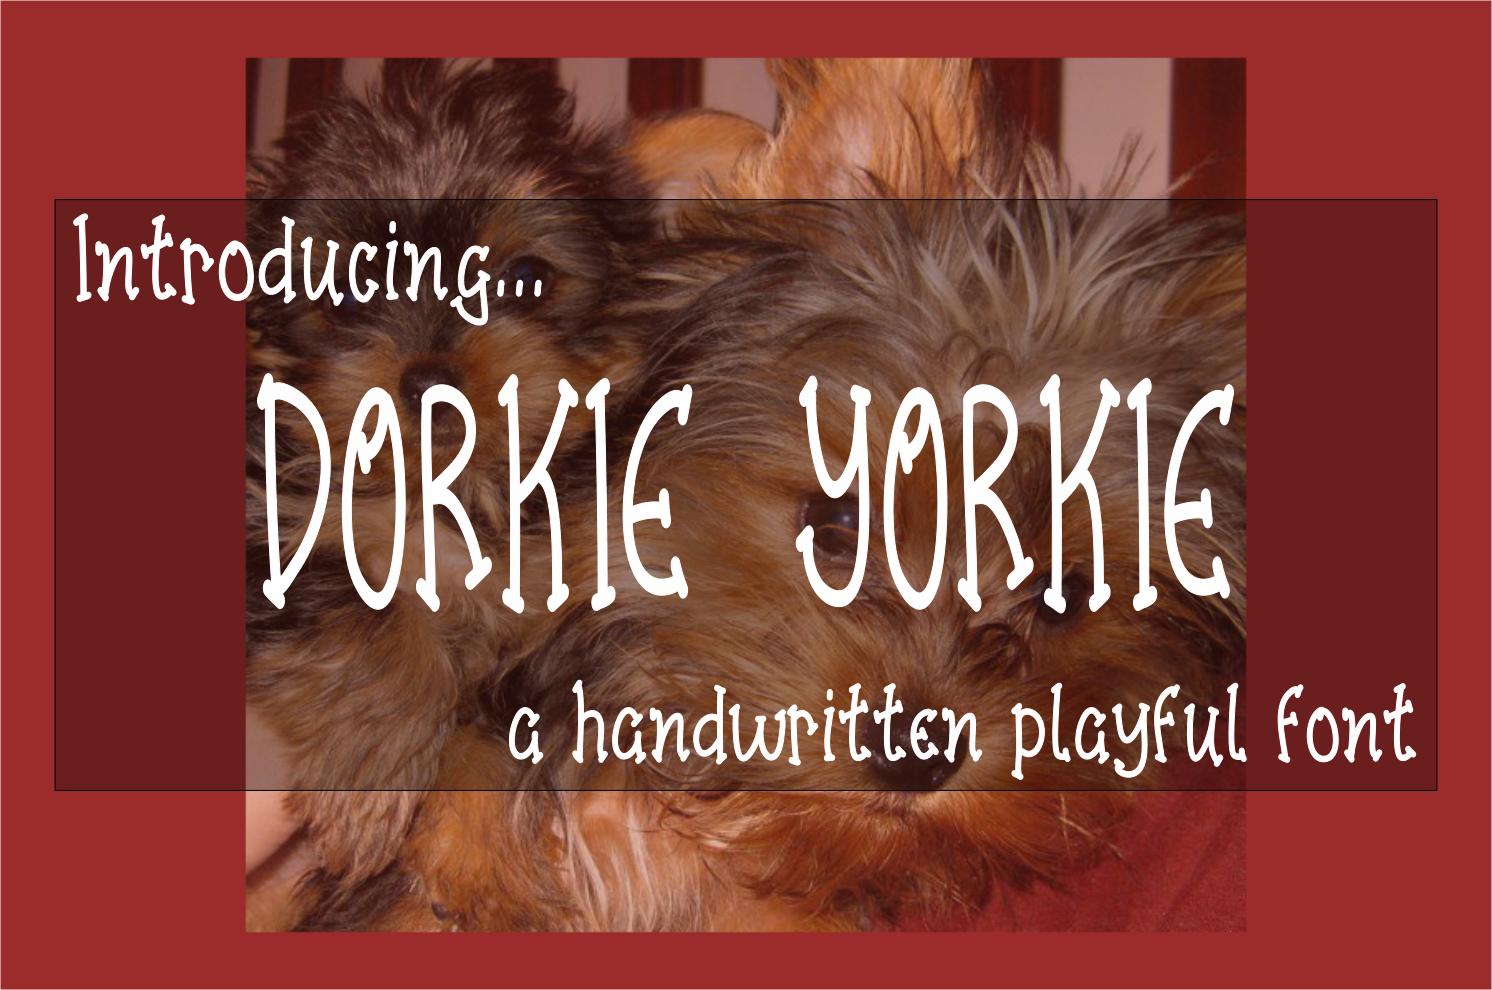 Dorkie Yorkie - A Handwritten Playful Font with BONUS SVG example image 1